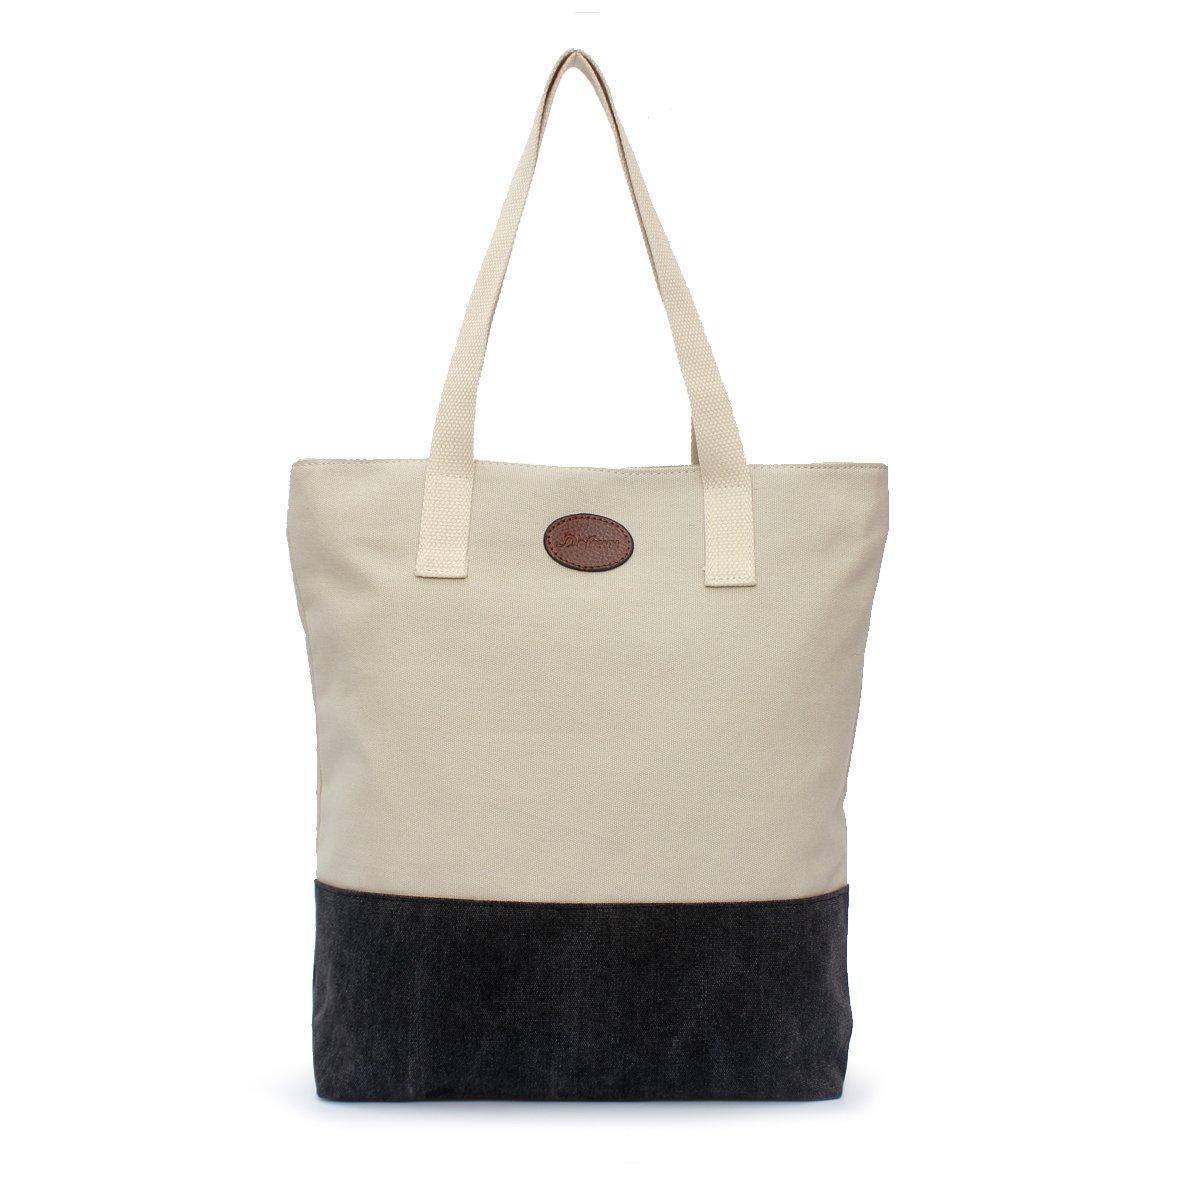 e3a8a890fdf8 Buy Women  39 s Heavy Duty Canvas Tote Bag DOIOWN Canvas Shoulder Bag Work  Bag School Tote(Washable